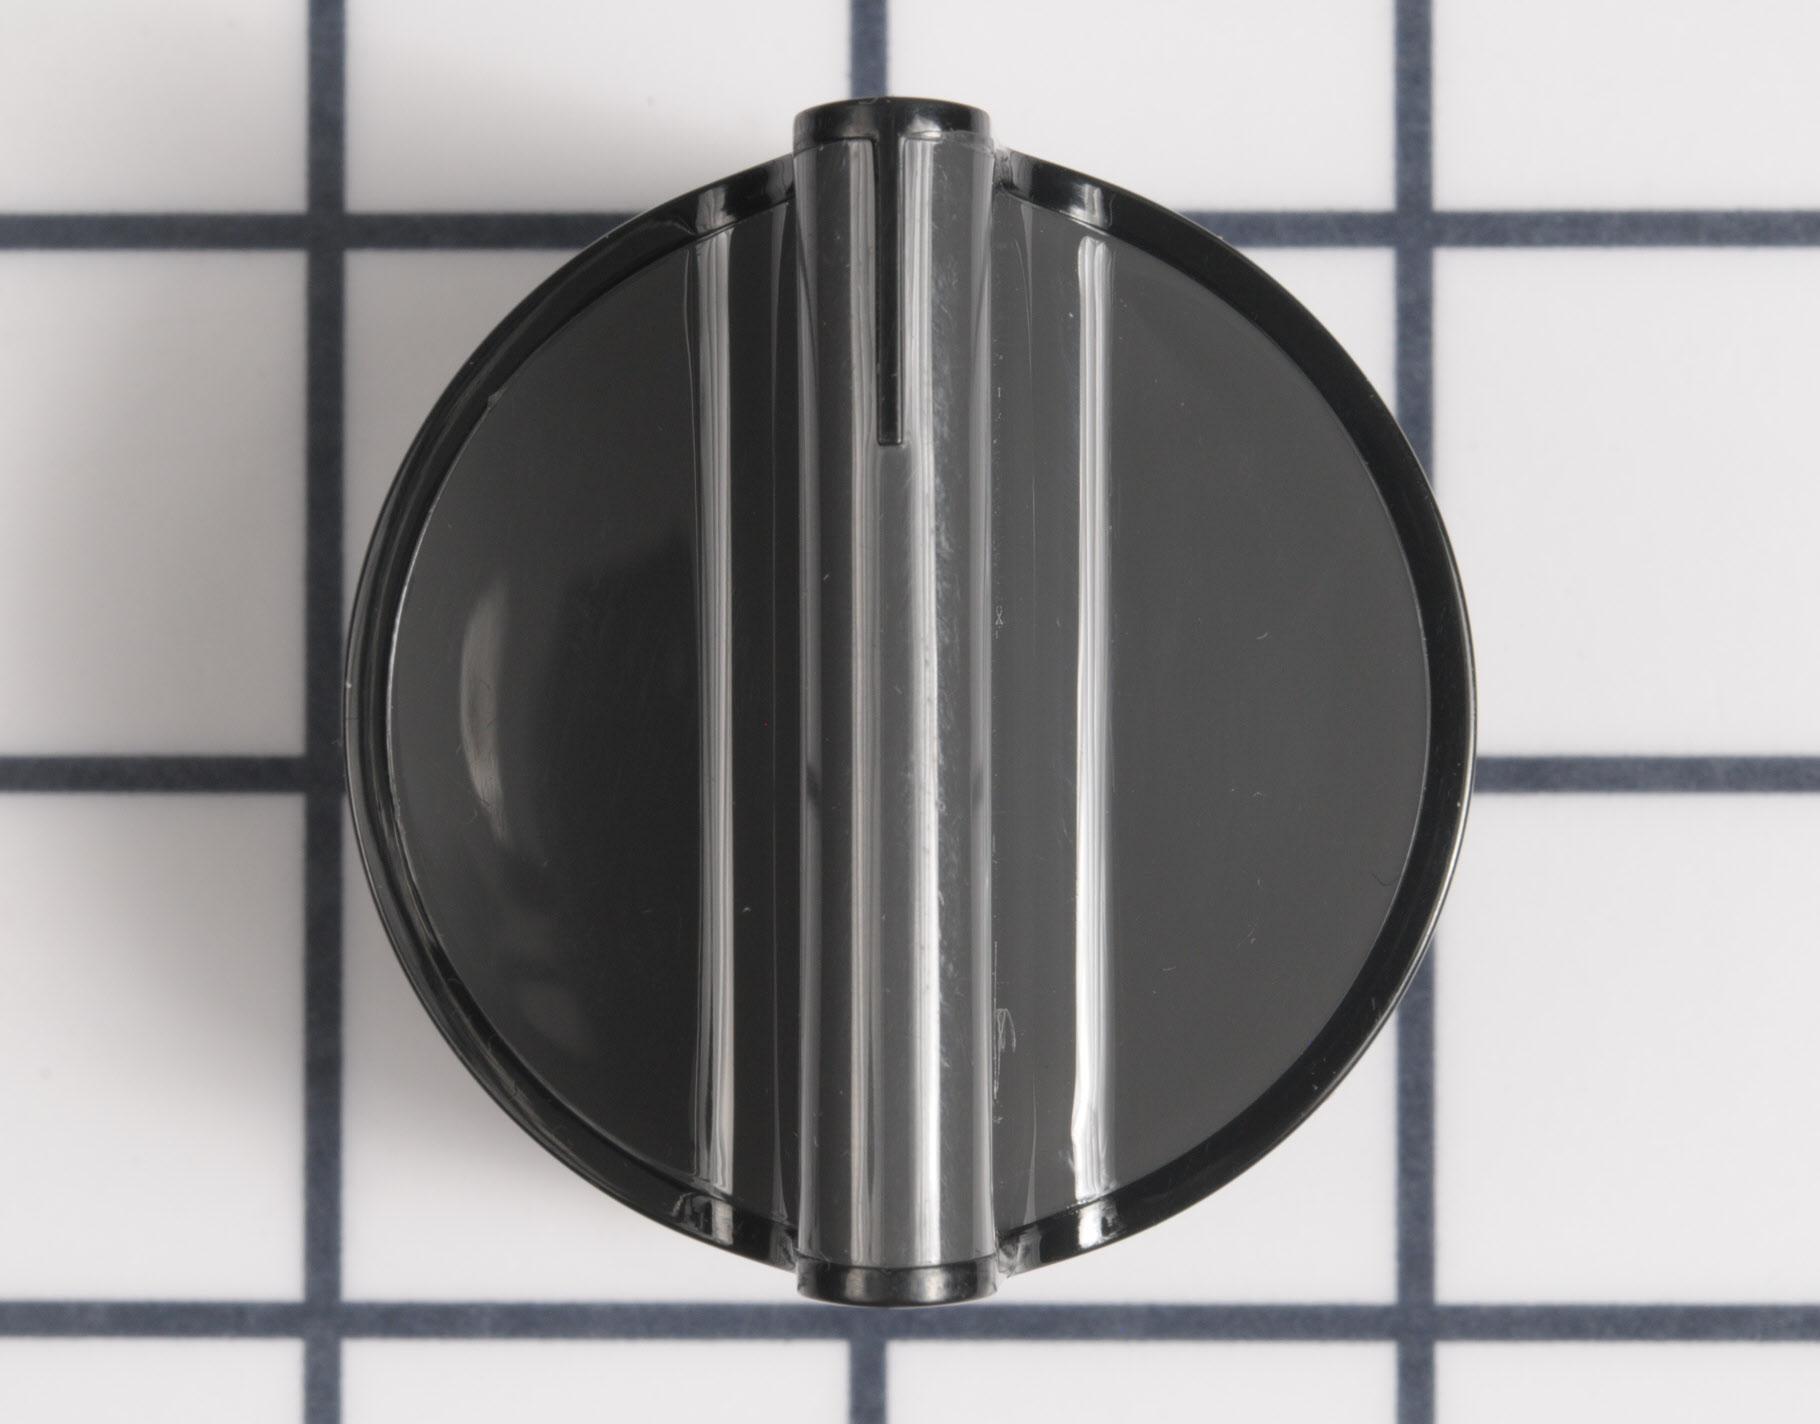 W10826855 Whirlpool Range Stove Oven Part -Control Knob